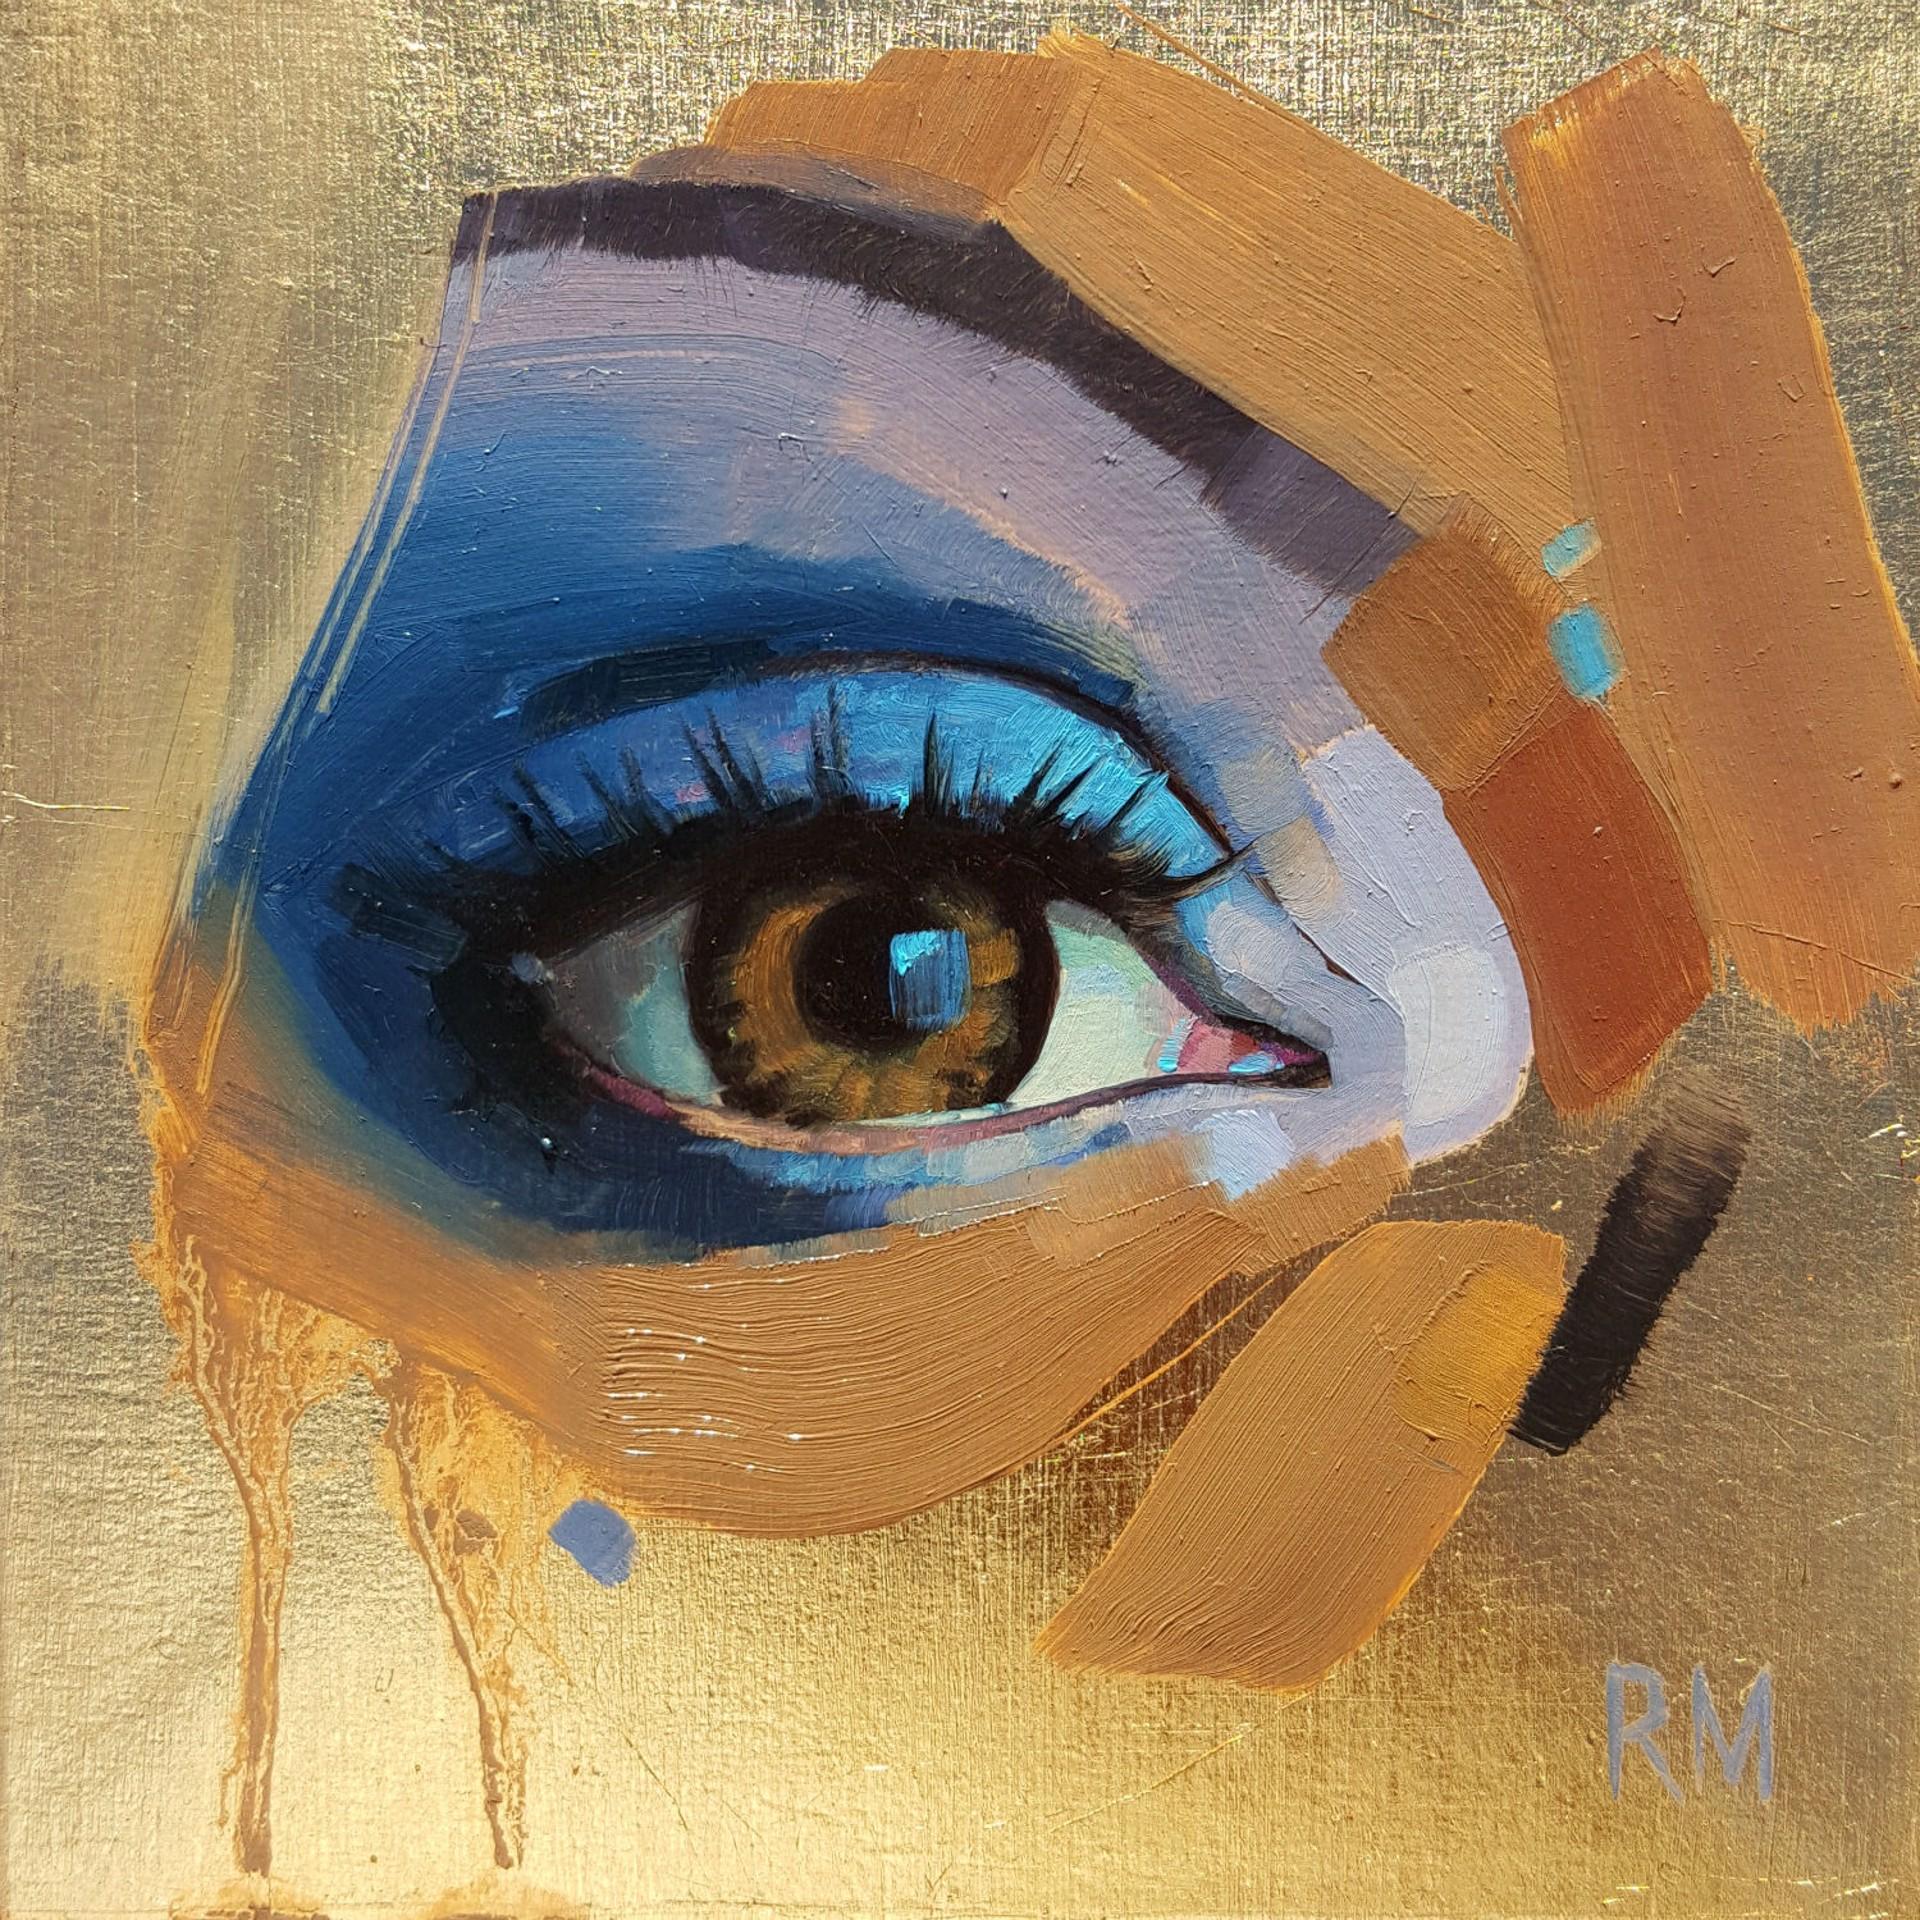 Golden Eye by Ryan Morse